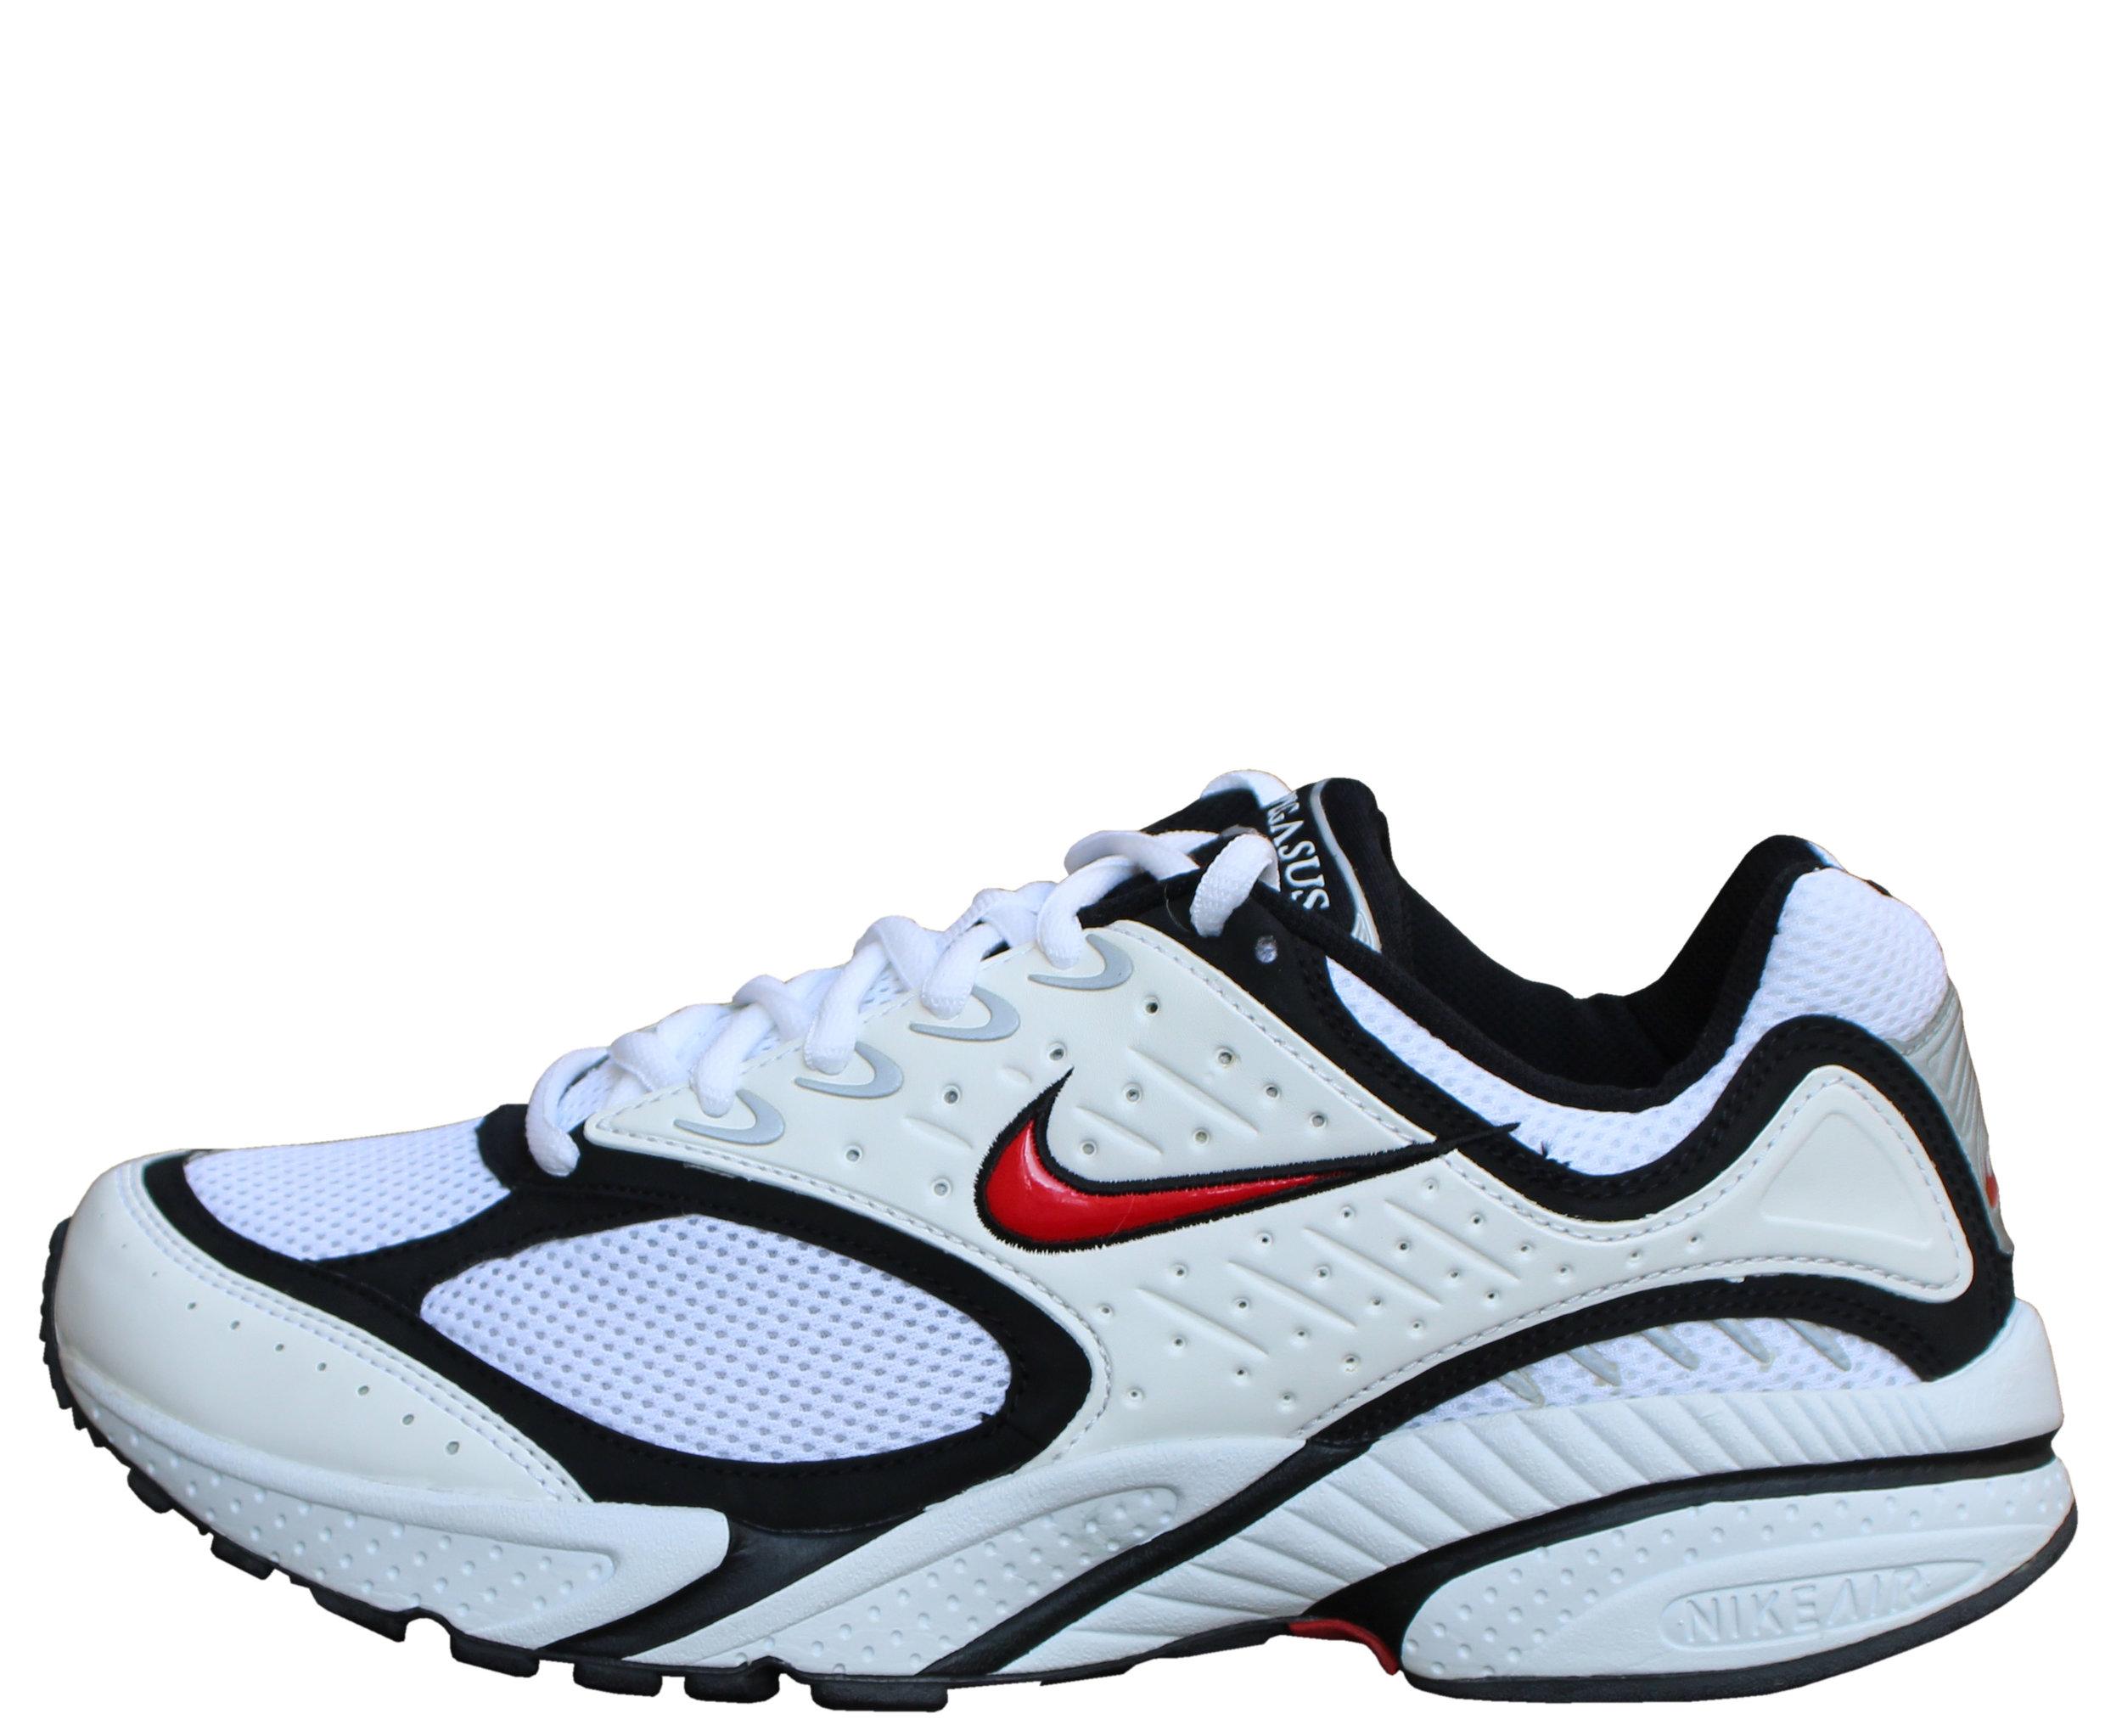 Nike Air Pegasus 2004 White / Sport Red